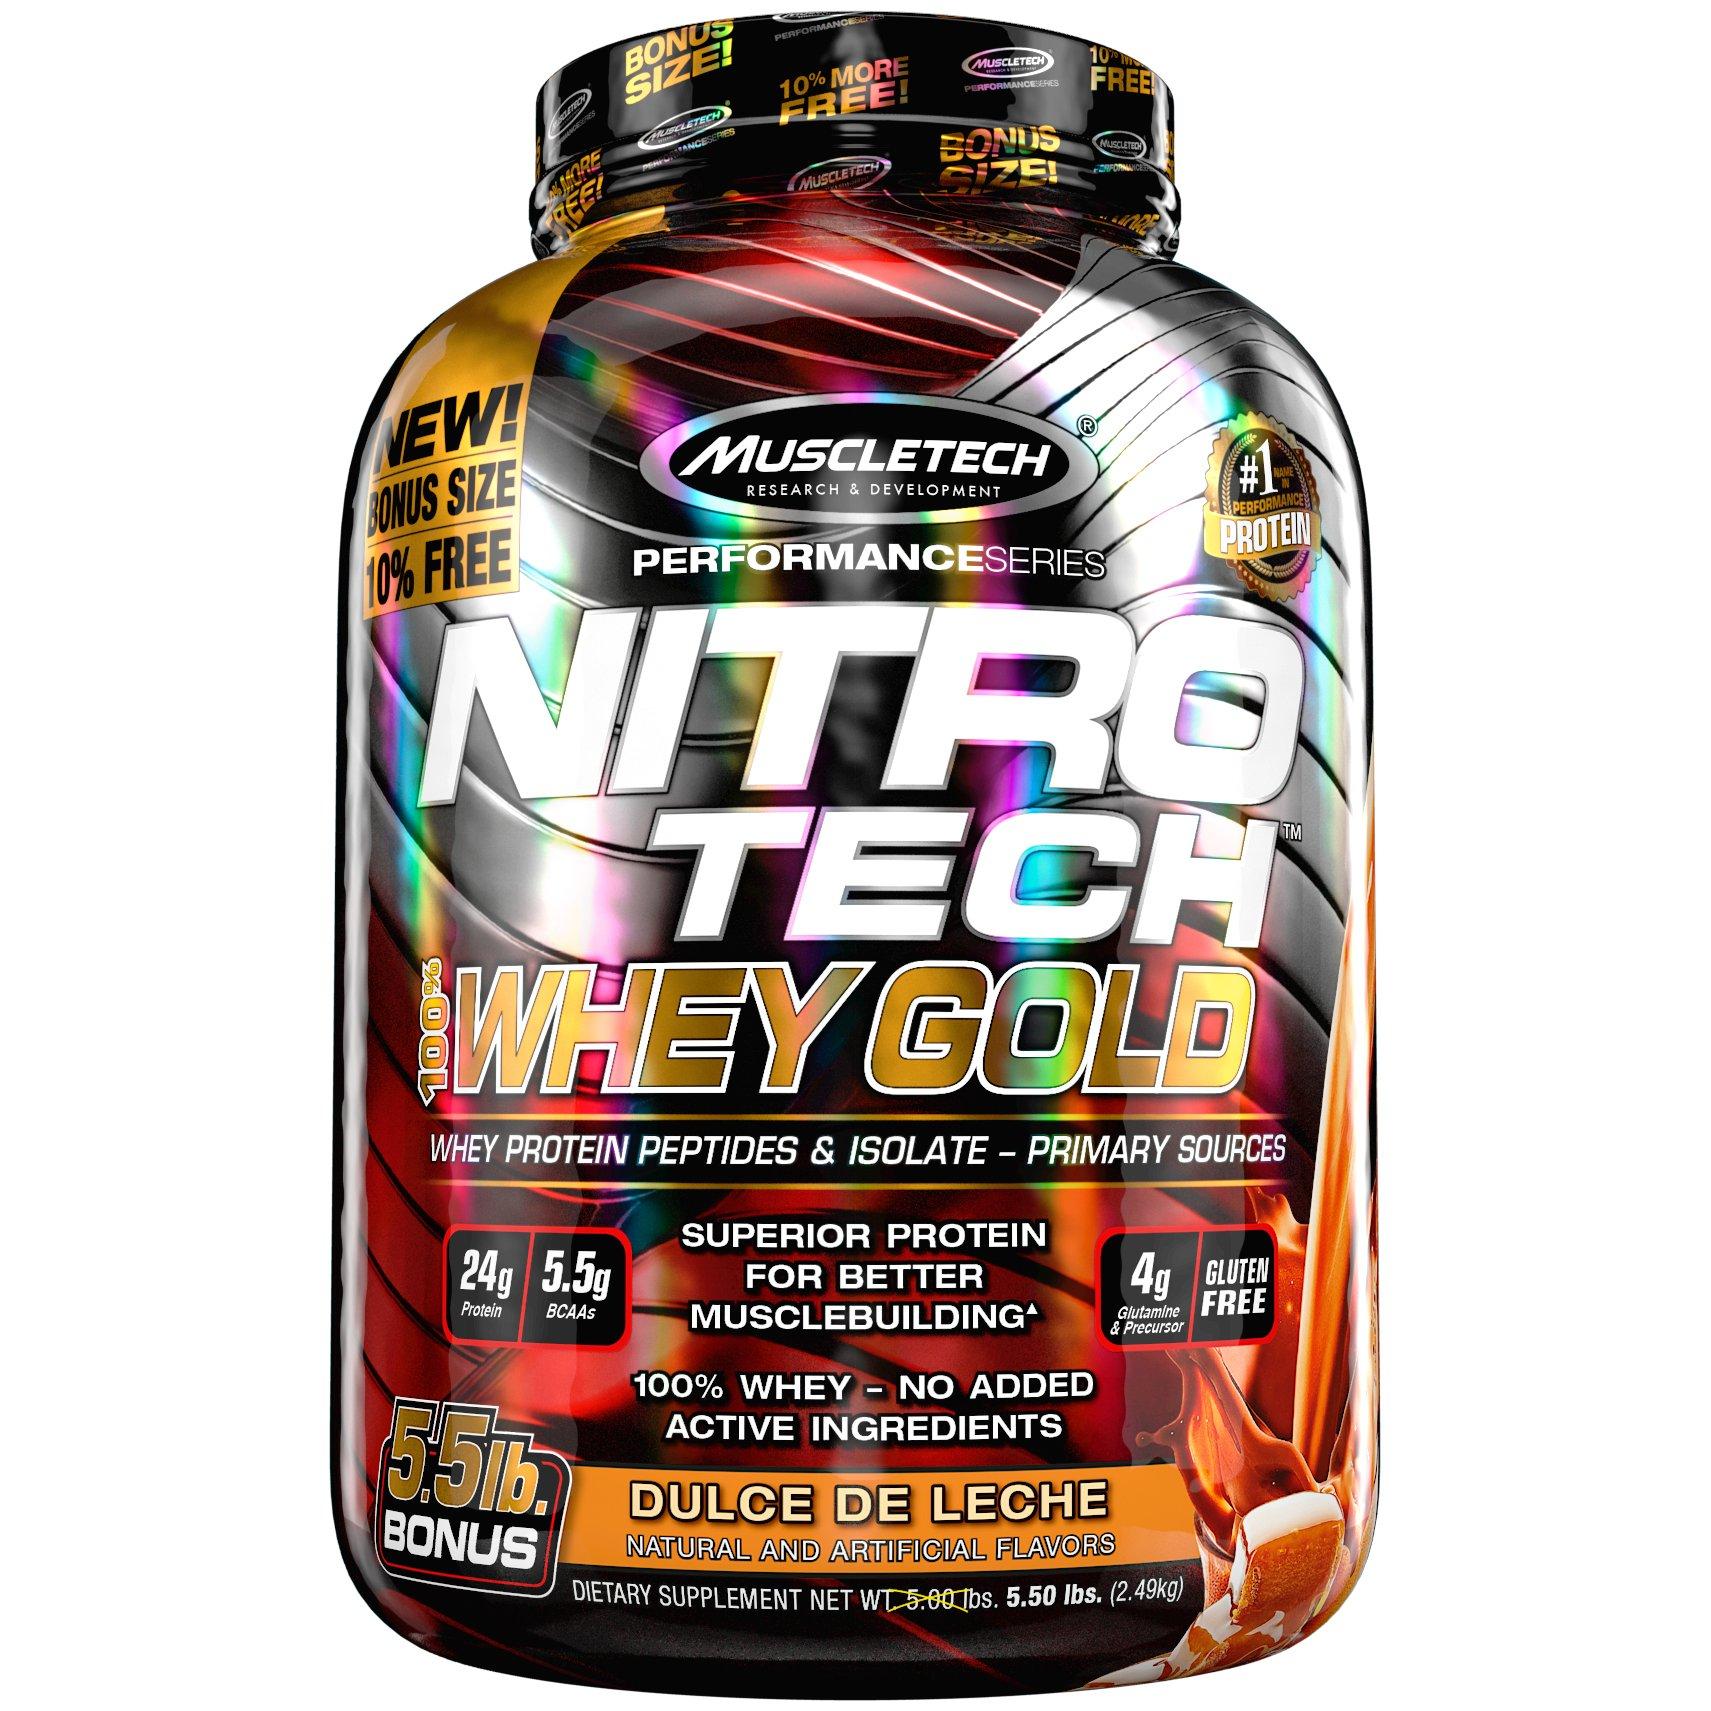 MuscleTech Nitrotech Whey Gold/Isolate/Peptides, Dulce De Leche, 5.5 Pound